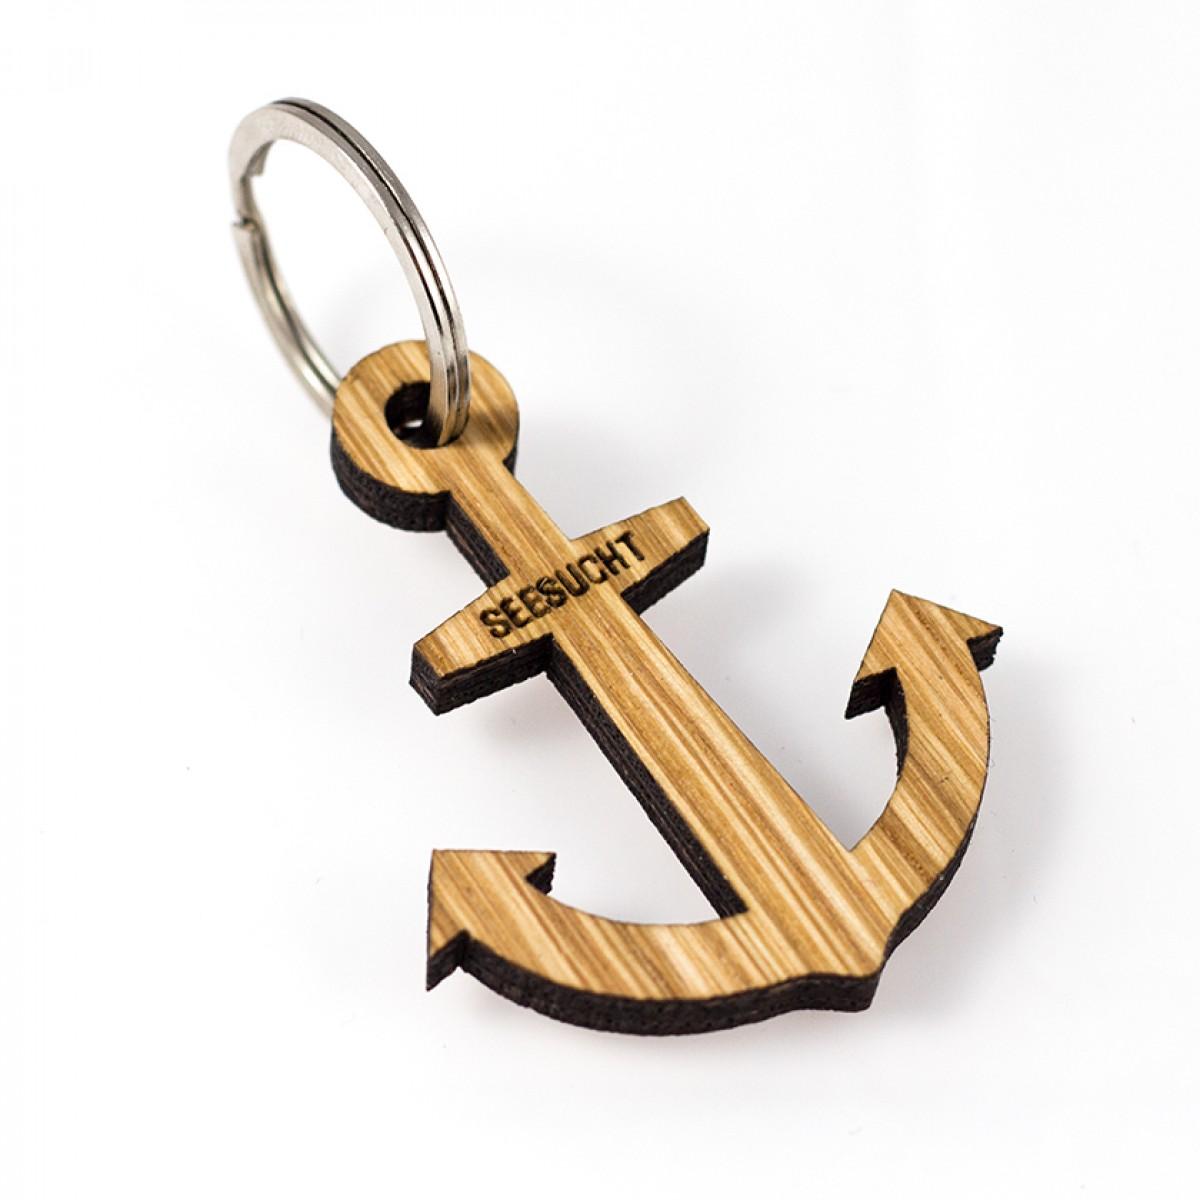 Seesucht Manufaktur Schlüsselanhänger Anker